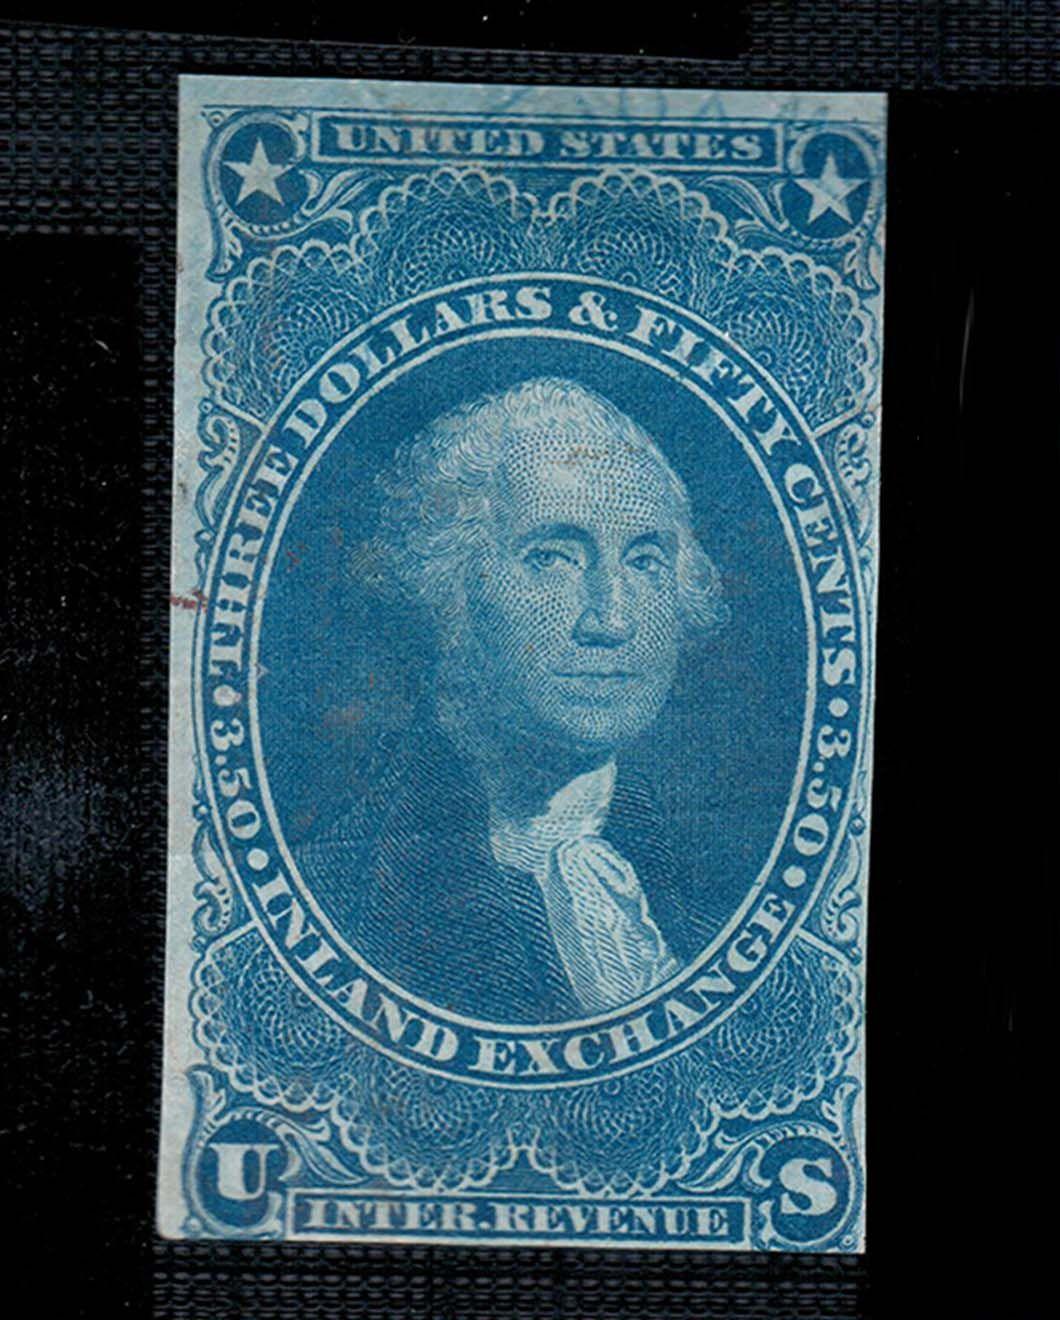 2,250.00 ♛[75 OFF] US Stamp 1862 Scott R87a CV 9,000.00